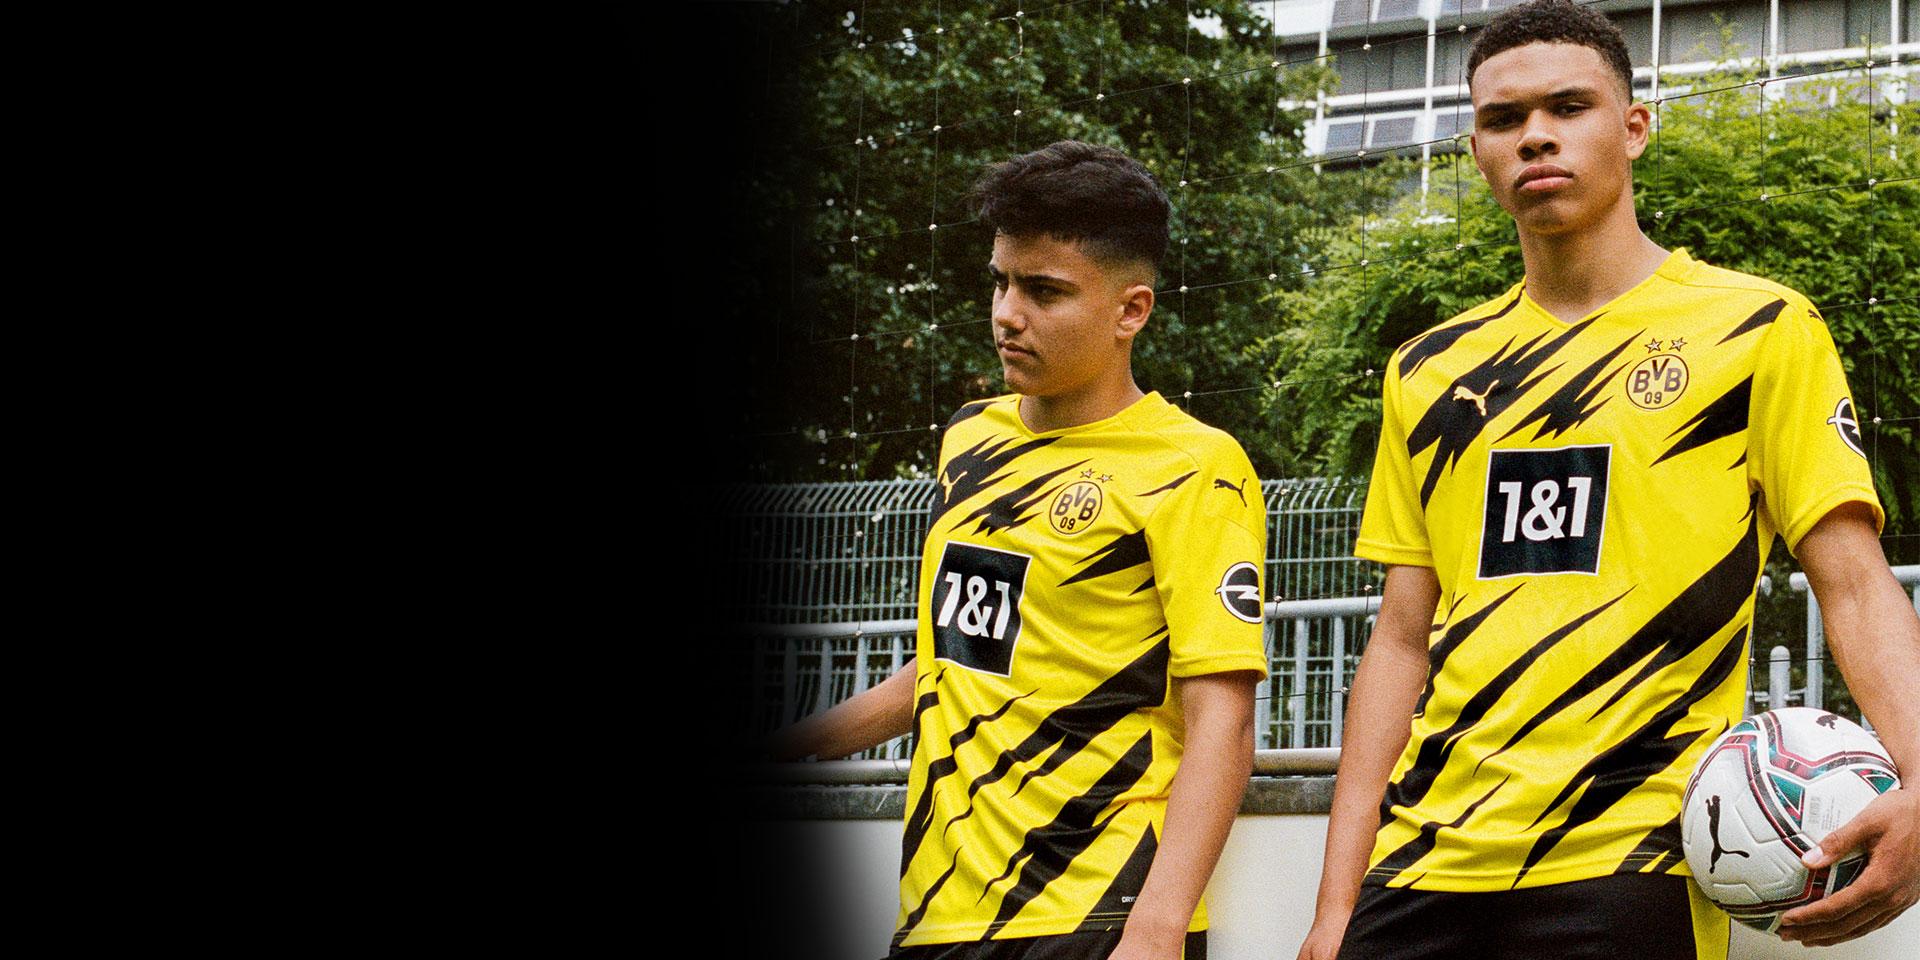 Puma Puma Presents The New Borussia Dortmund Home Kit Inspired By The U Bahnhof Westfalenhallen